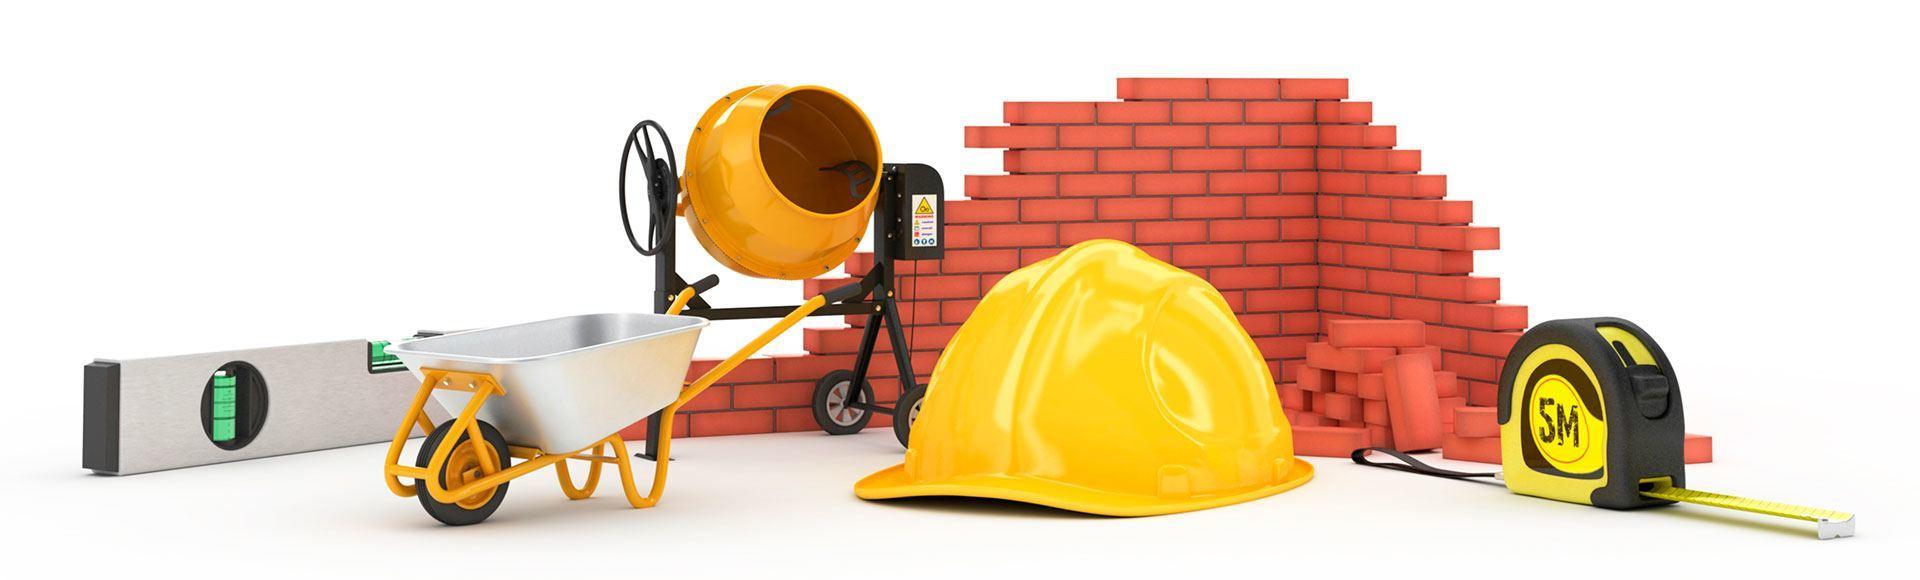 We Can Handle It Building Materials Clipart #ieZF74.